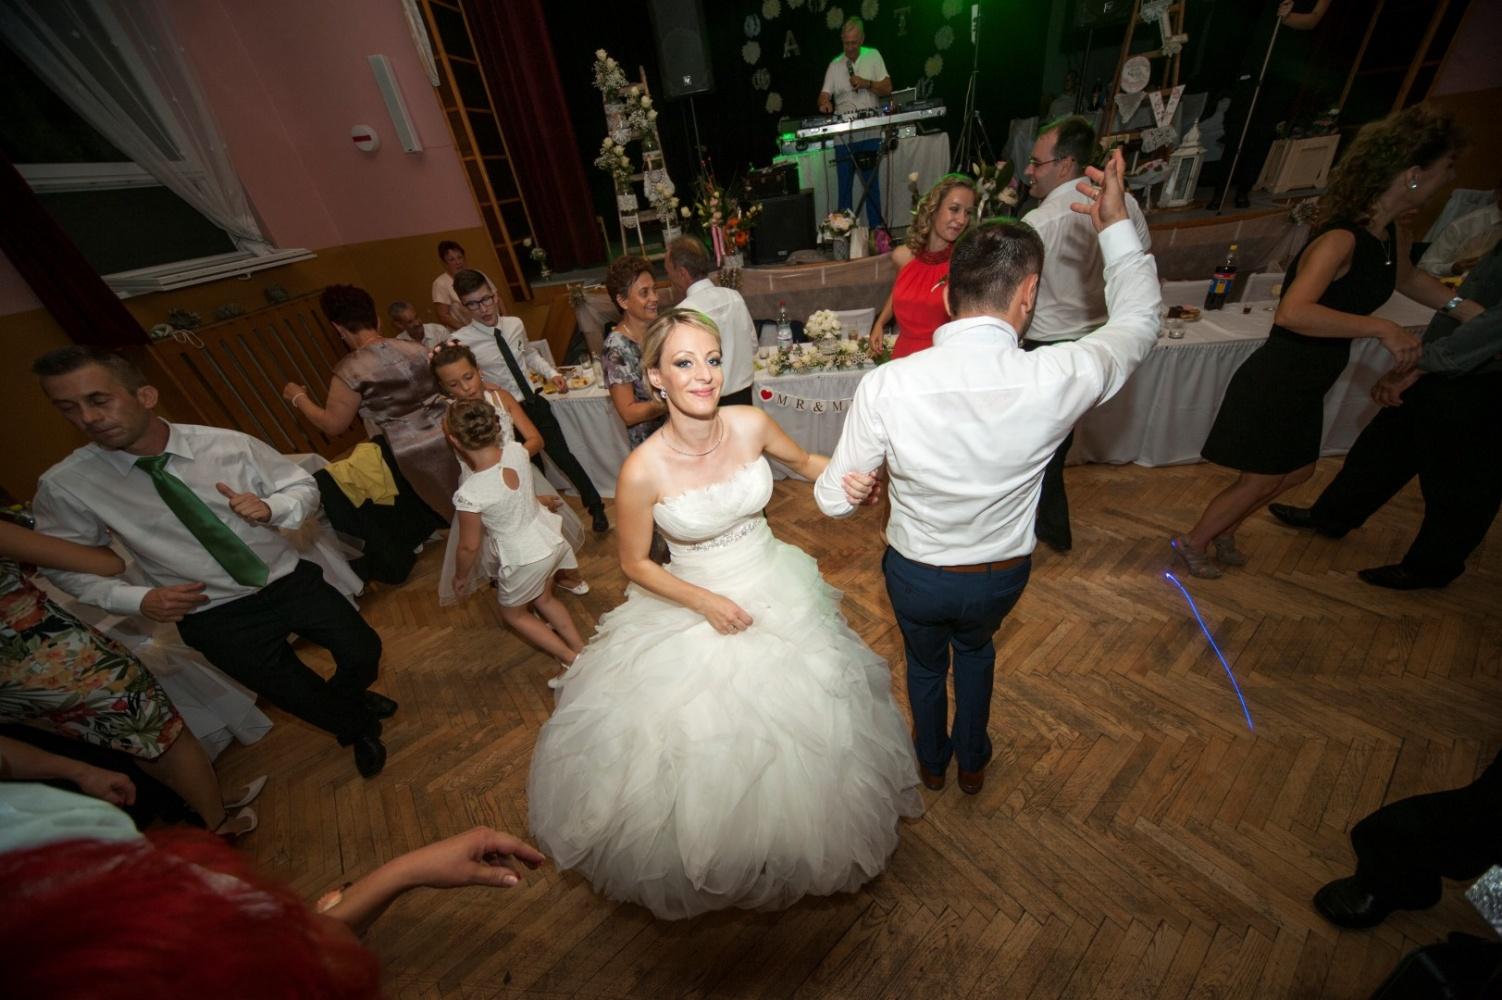 http://www.fotoz.sk/images/gallery-21/normal/svadobne-fotenie_eskuvoi-fotos_321.jpg